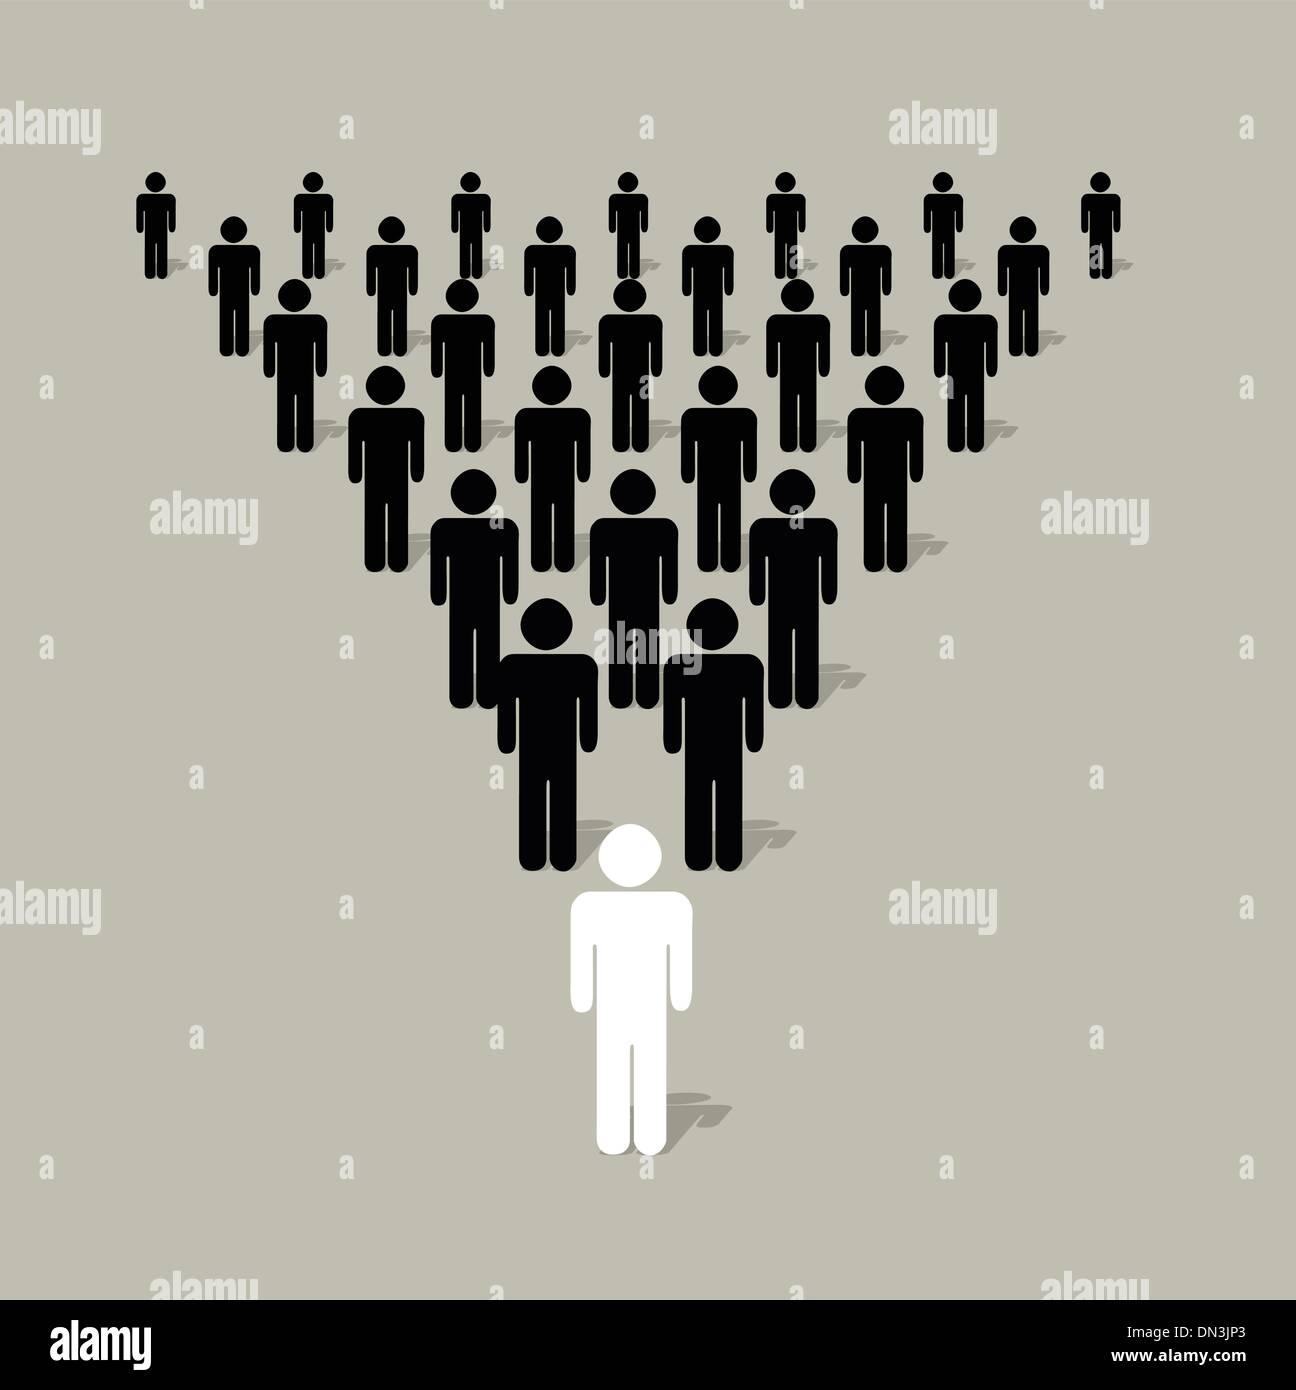 Leadership - Stock Image